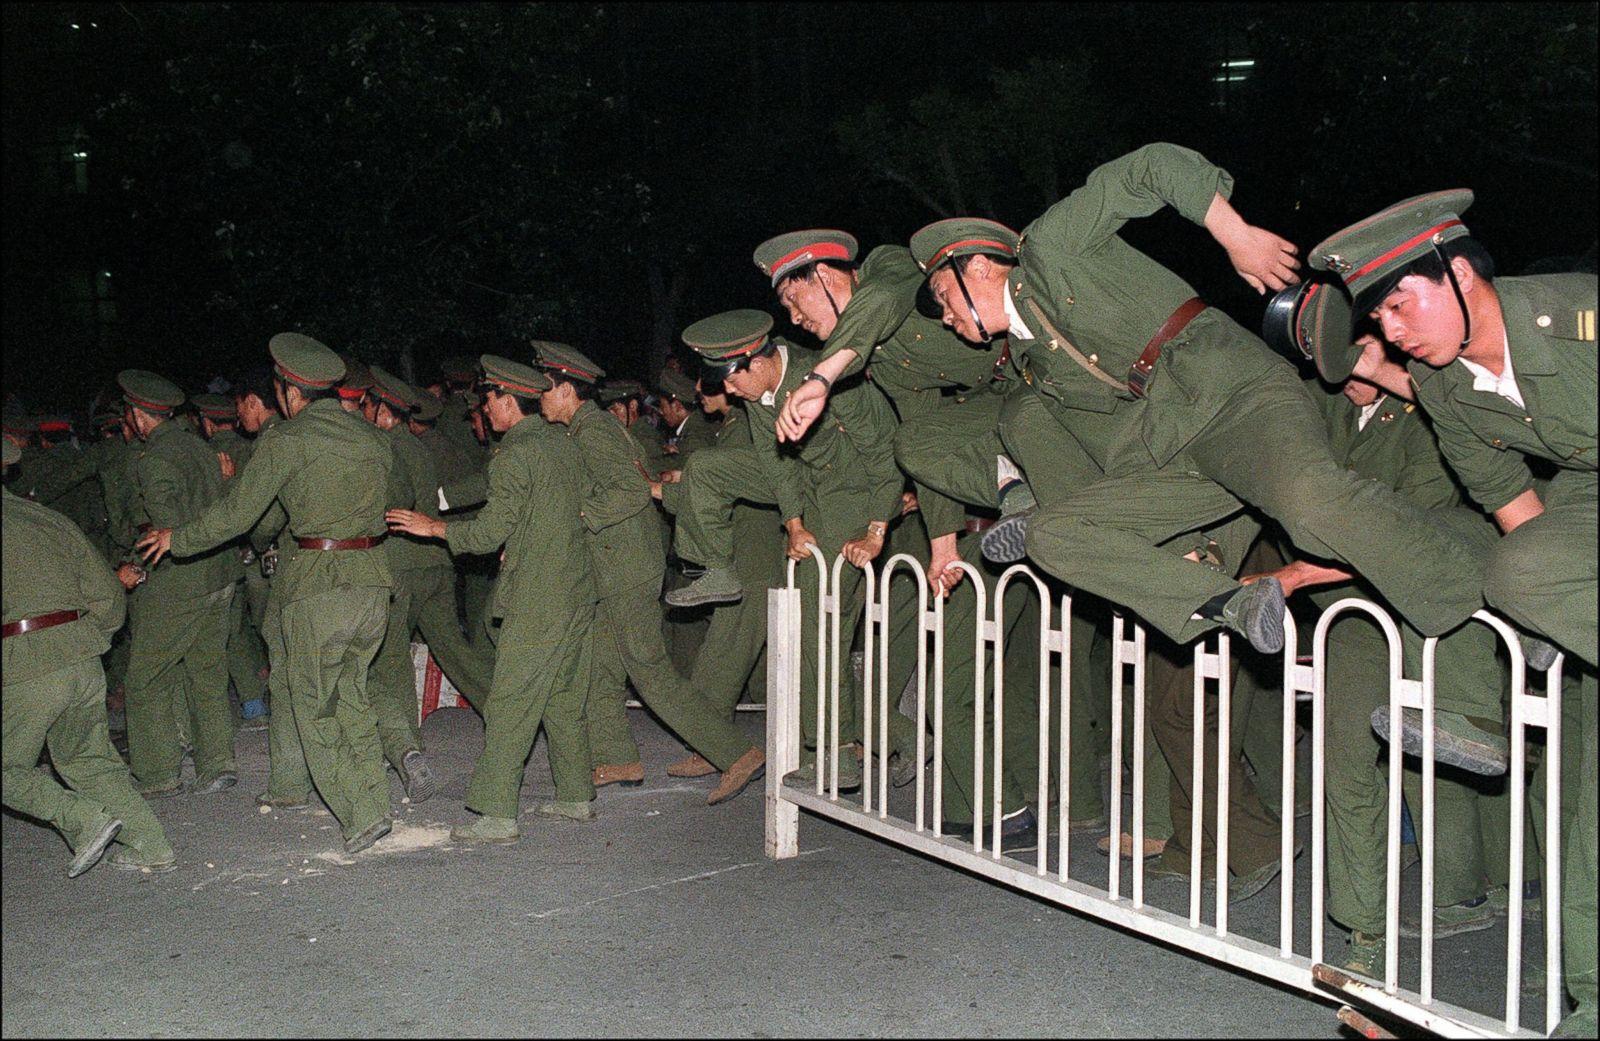 http://a.abcnews.com/images/International/GTY_Tiananmen_Square_7mar_140602_20x13_1600.jpg